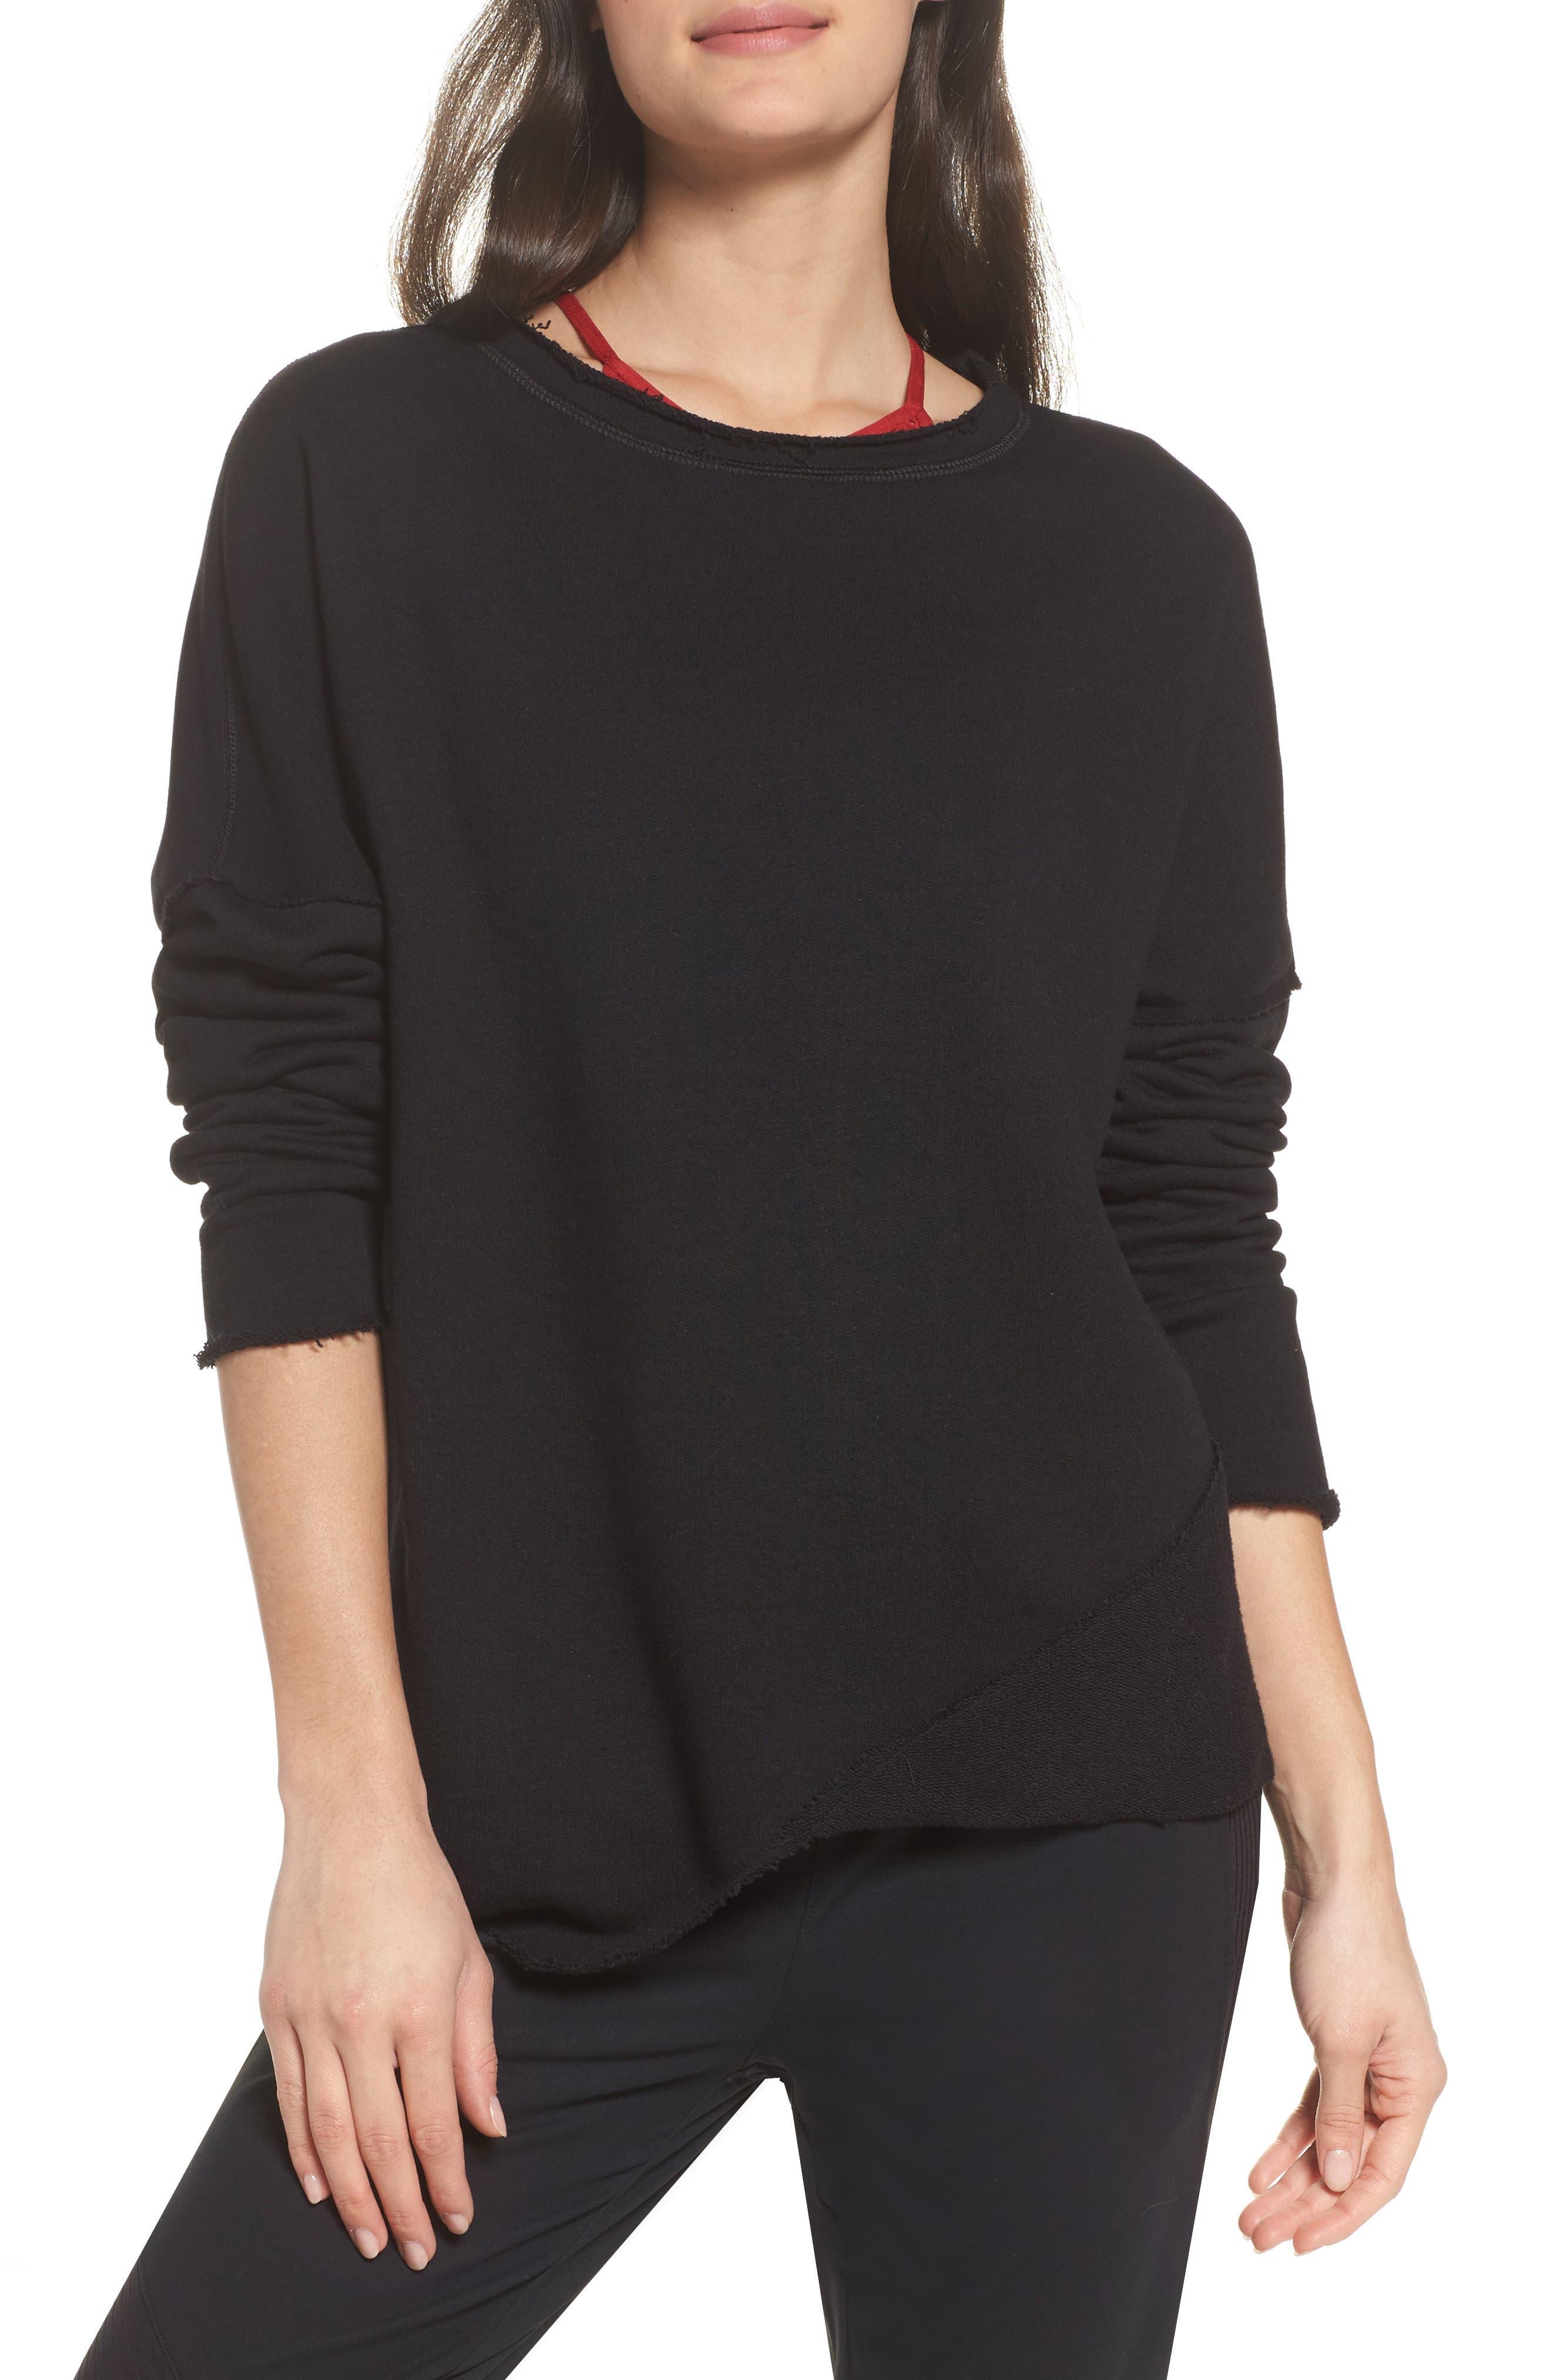 Exhale Sweatshirt,                             Main thumbnail 1, color,                             Black